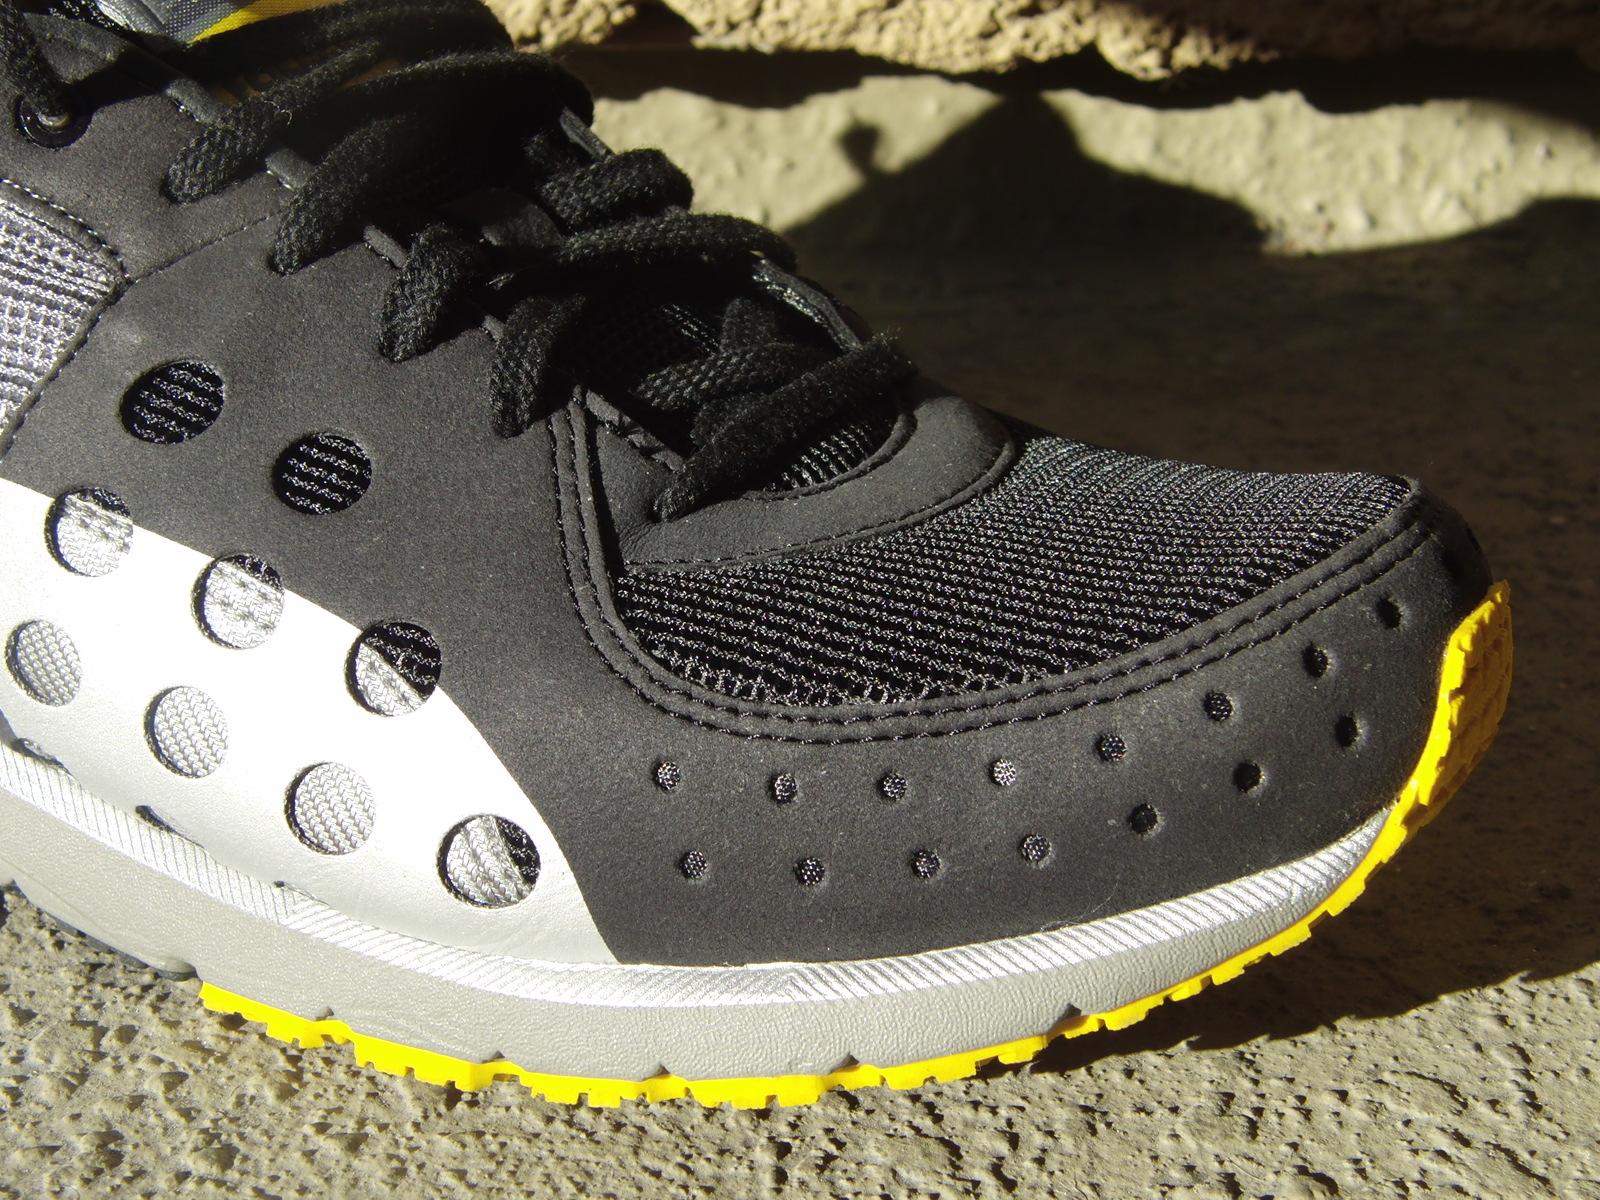 7483c3d4a869 Puma Faas 300 Running Shoe